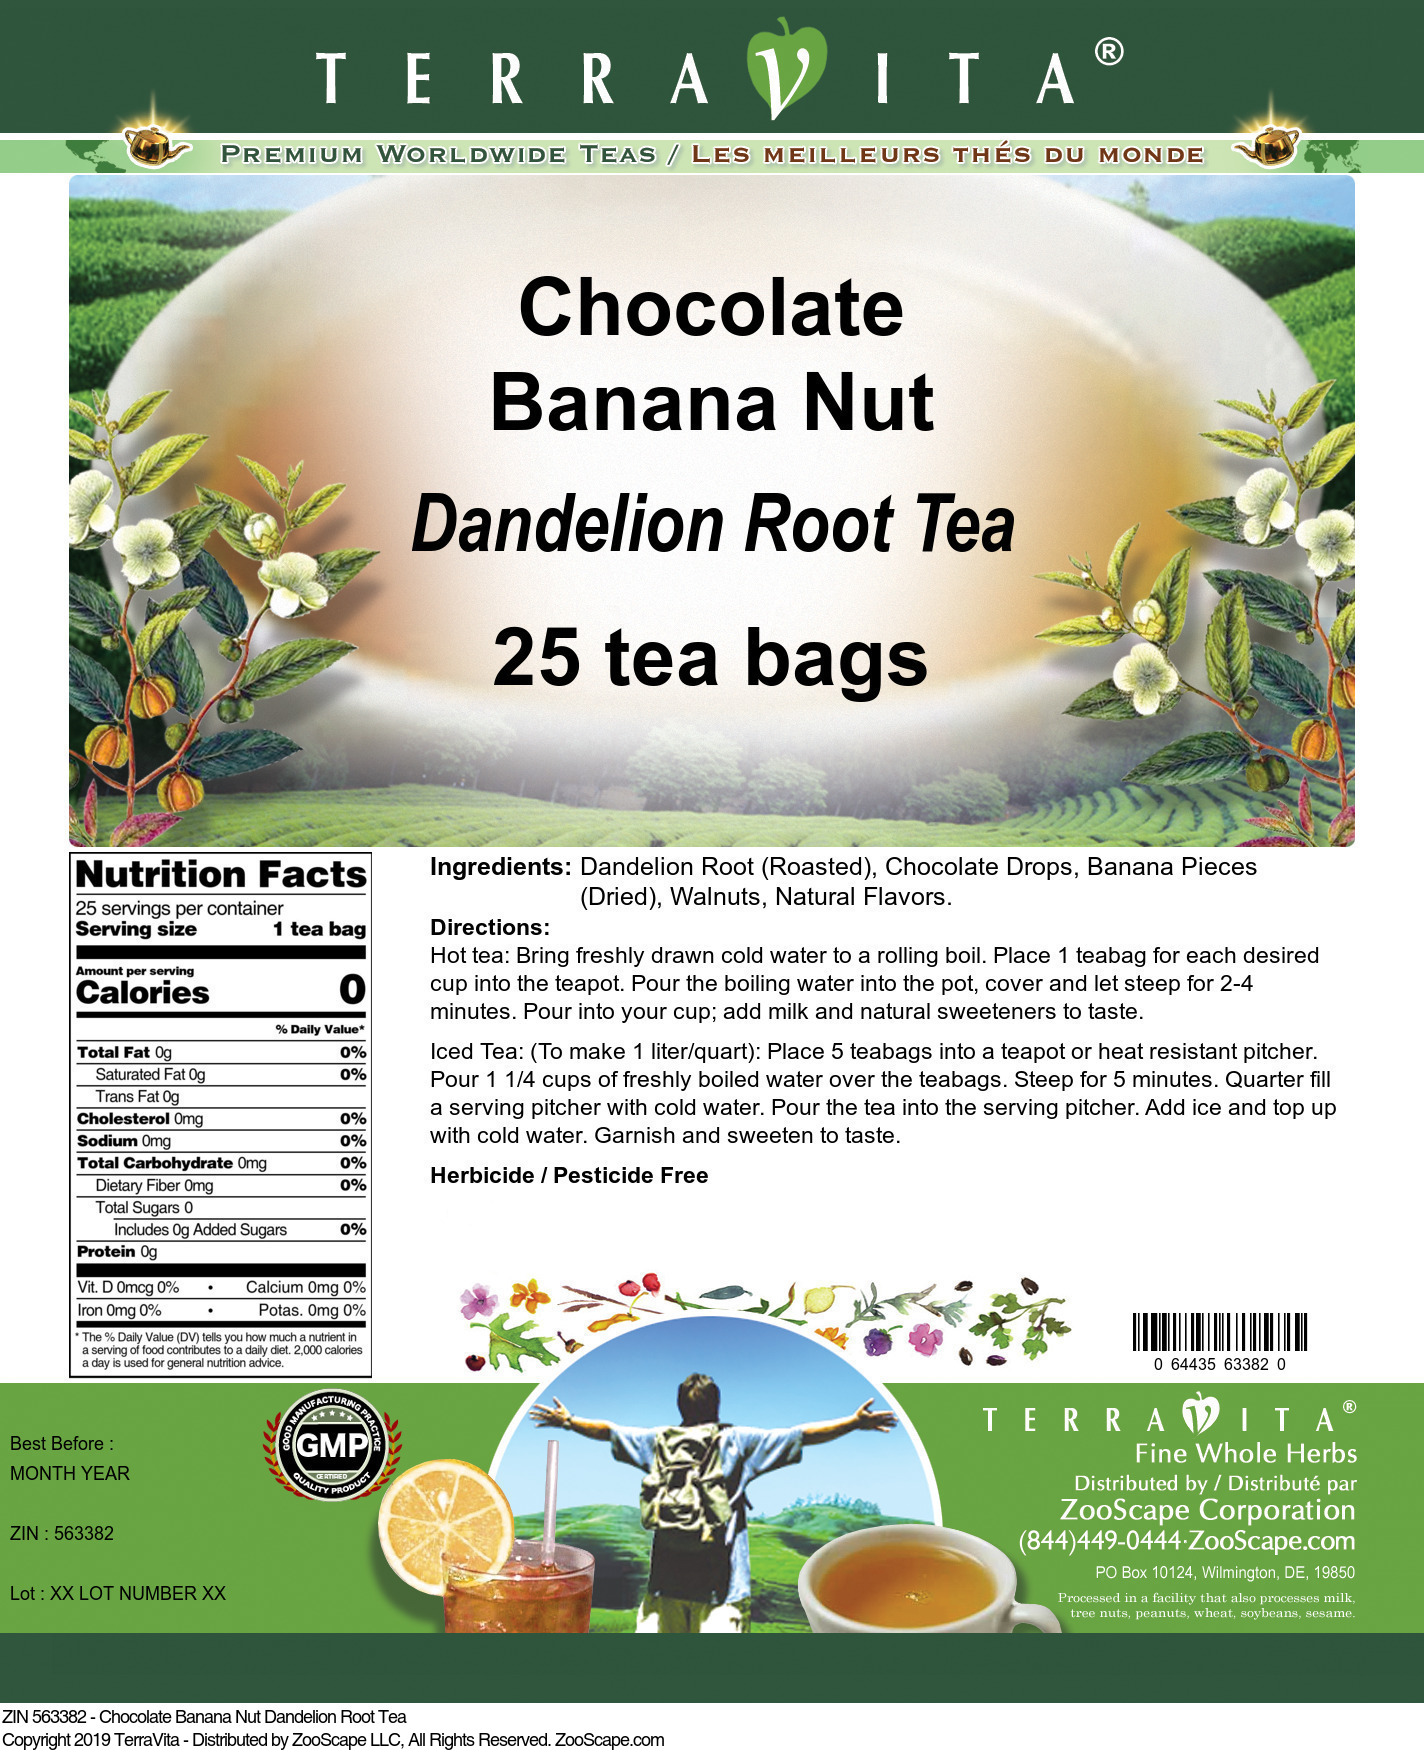 Chocolate Banana Nut Dandelion Root Tea